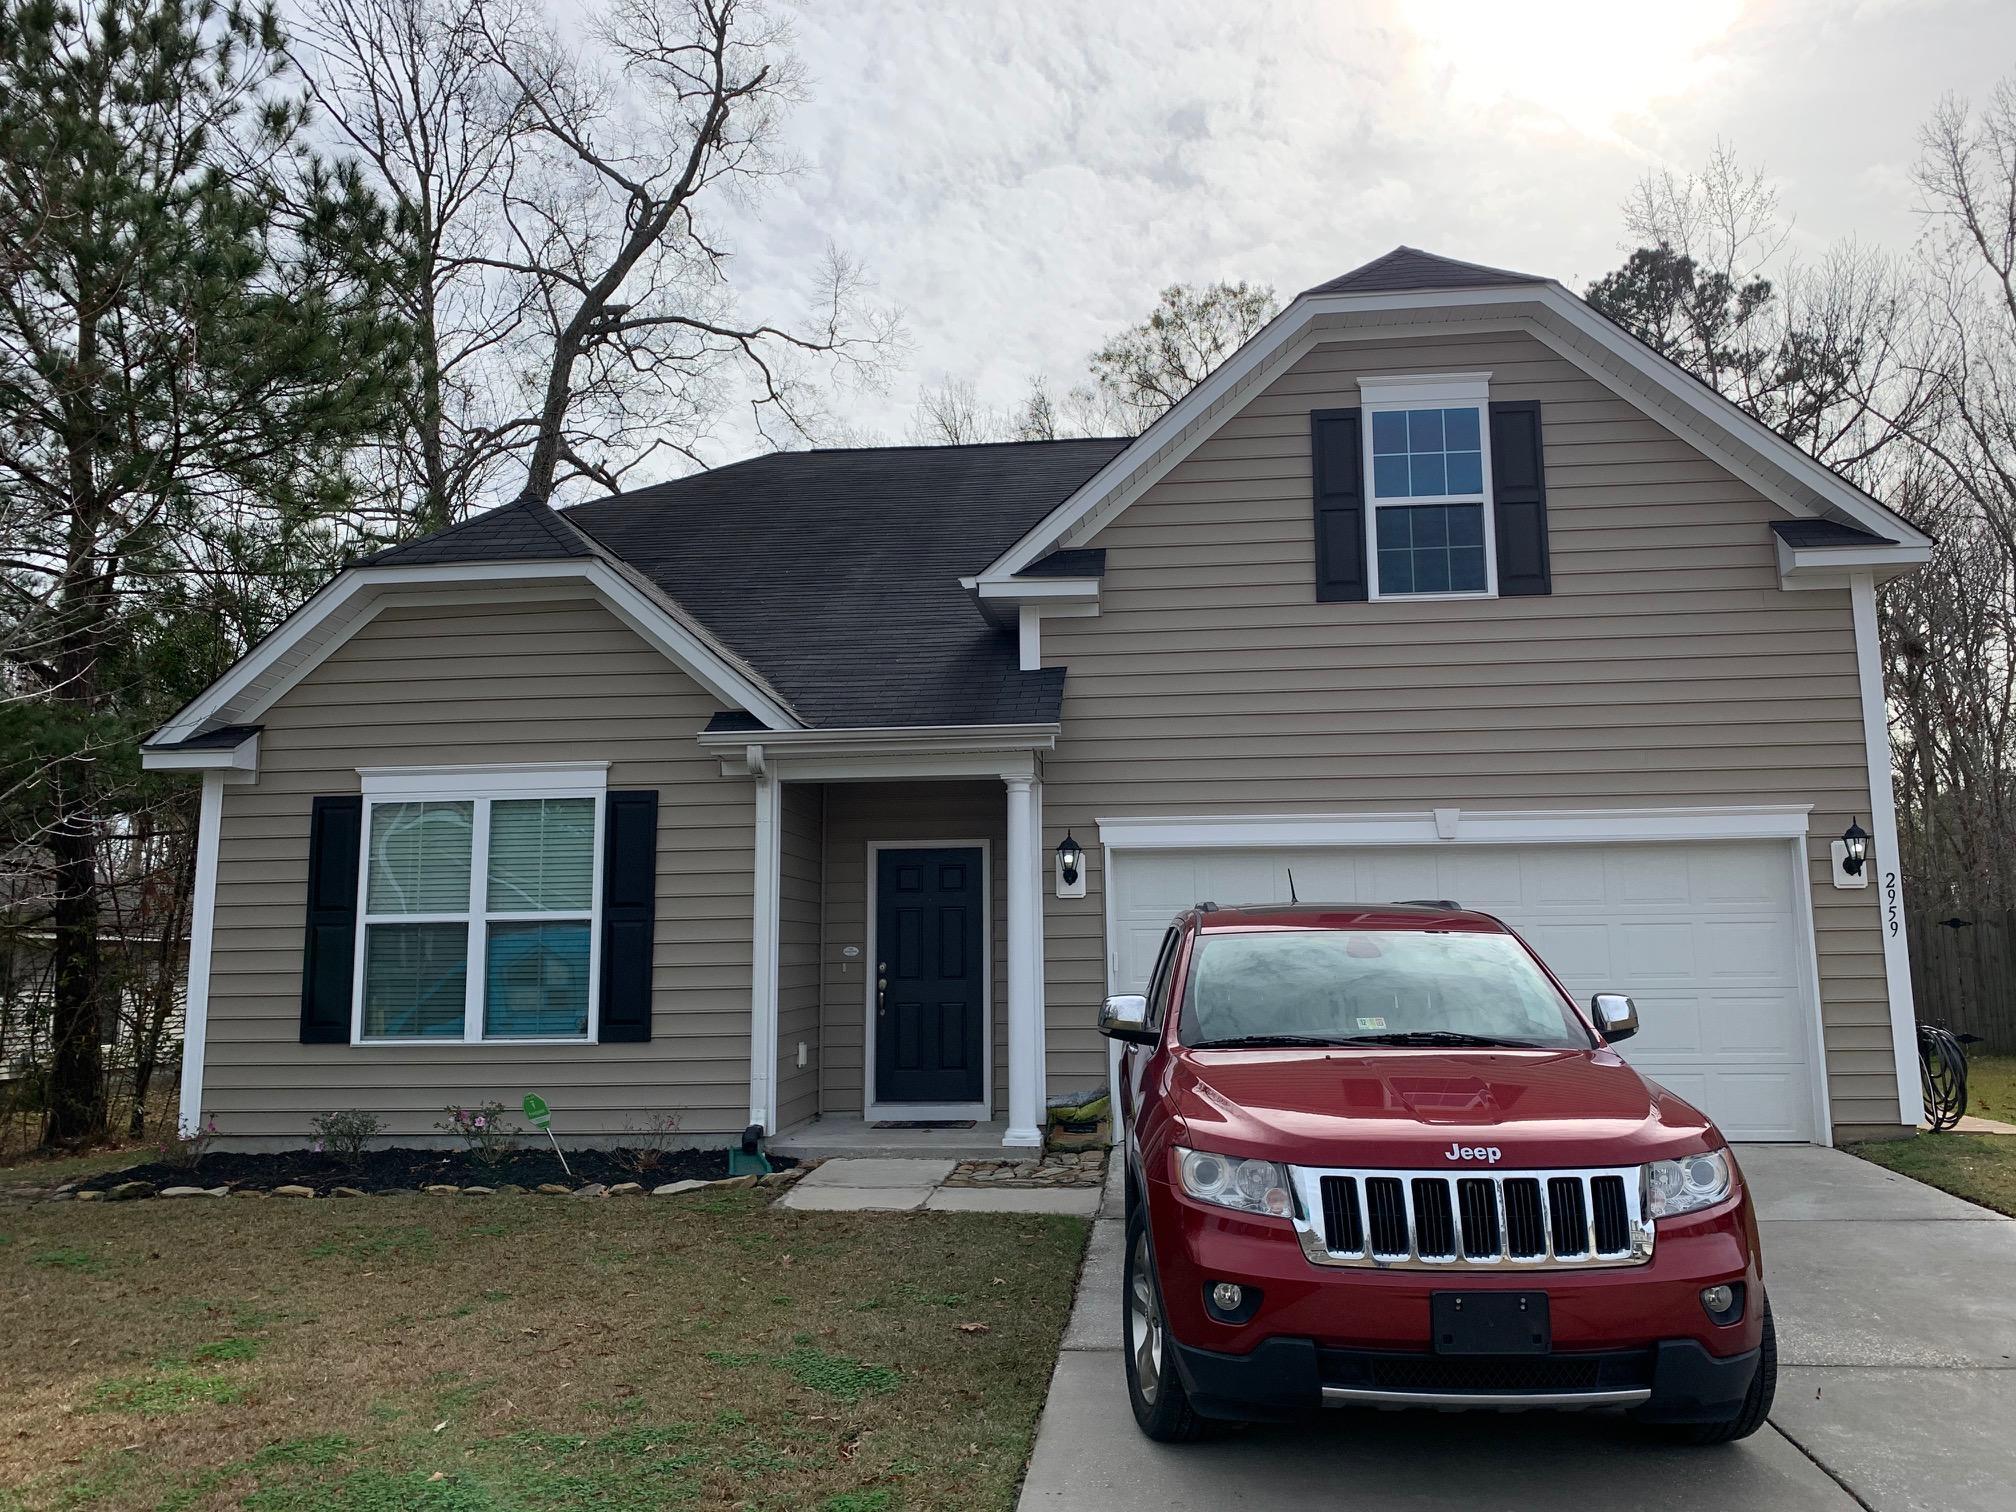 Colony North II Homes For Sale - 2959 Newport, North Charleston, SC - 0